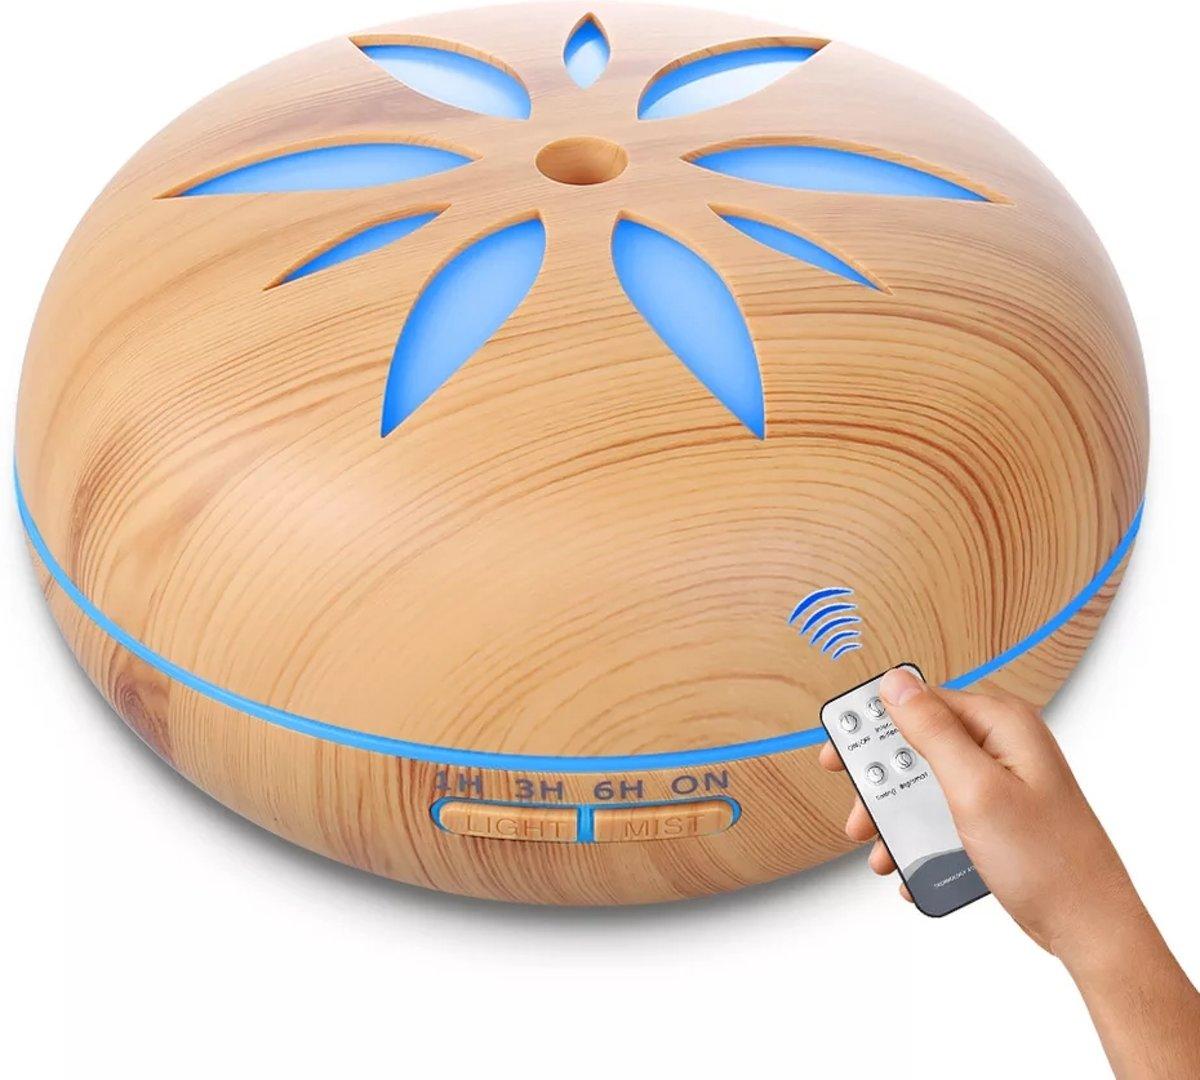 SensaHome ZEN500 Aroma diffuser Geur Verspreider +Afstandbediening /  Anti Bacterie Met Sfeervolle LED Verlichting - Luchtbevochtiger - Olie Verdamper/Olie Vernevelaar